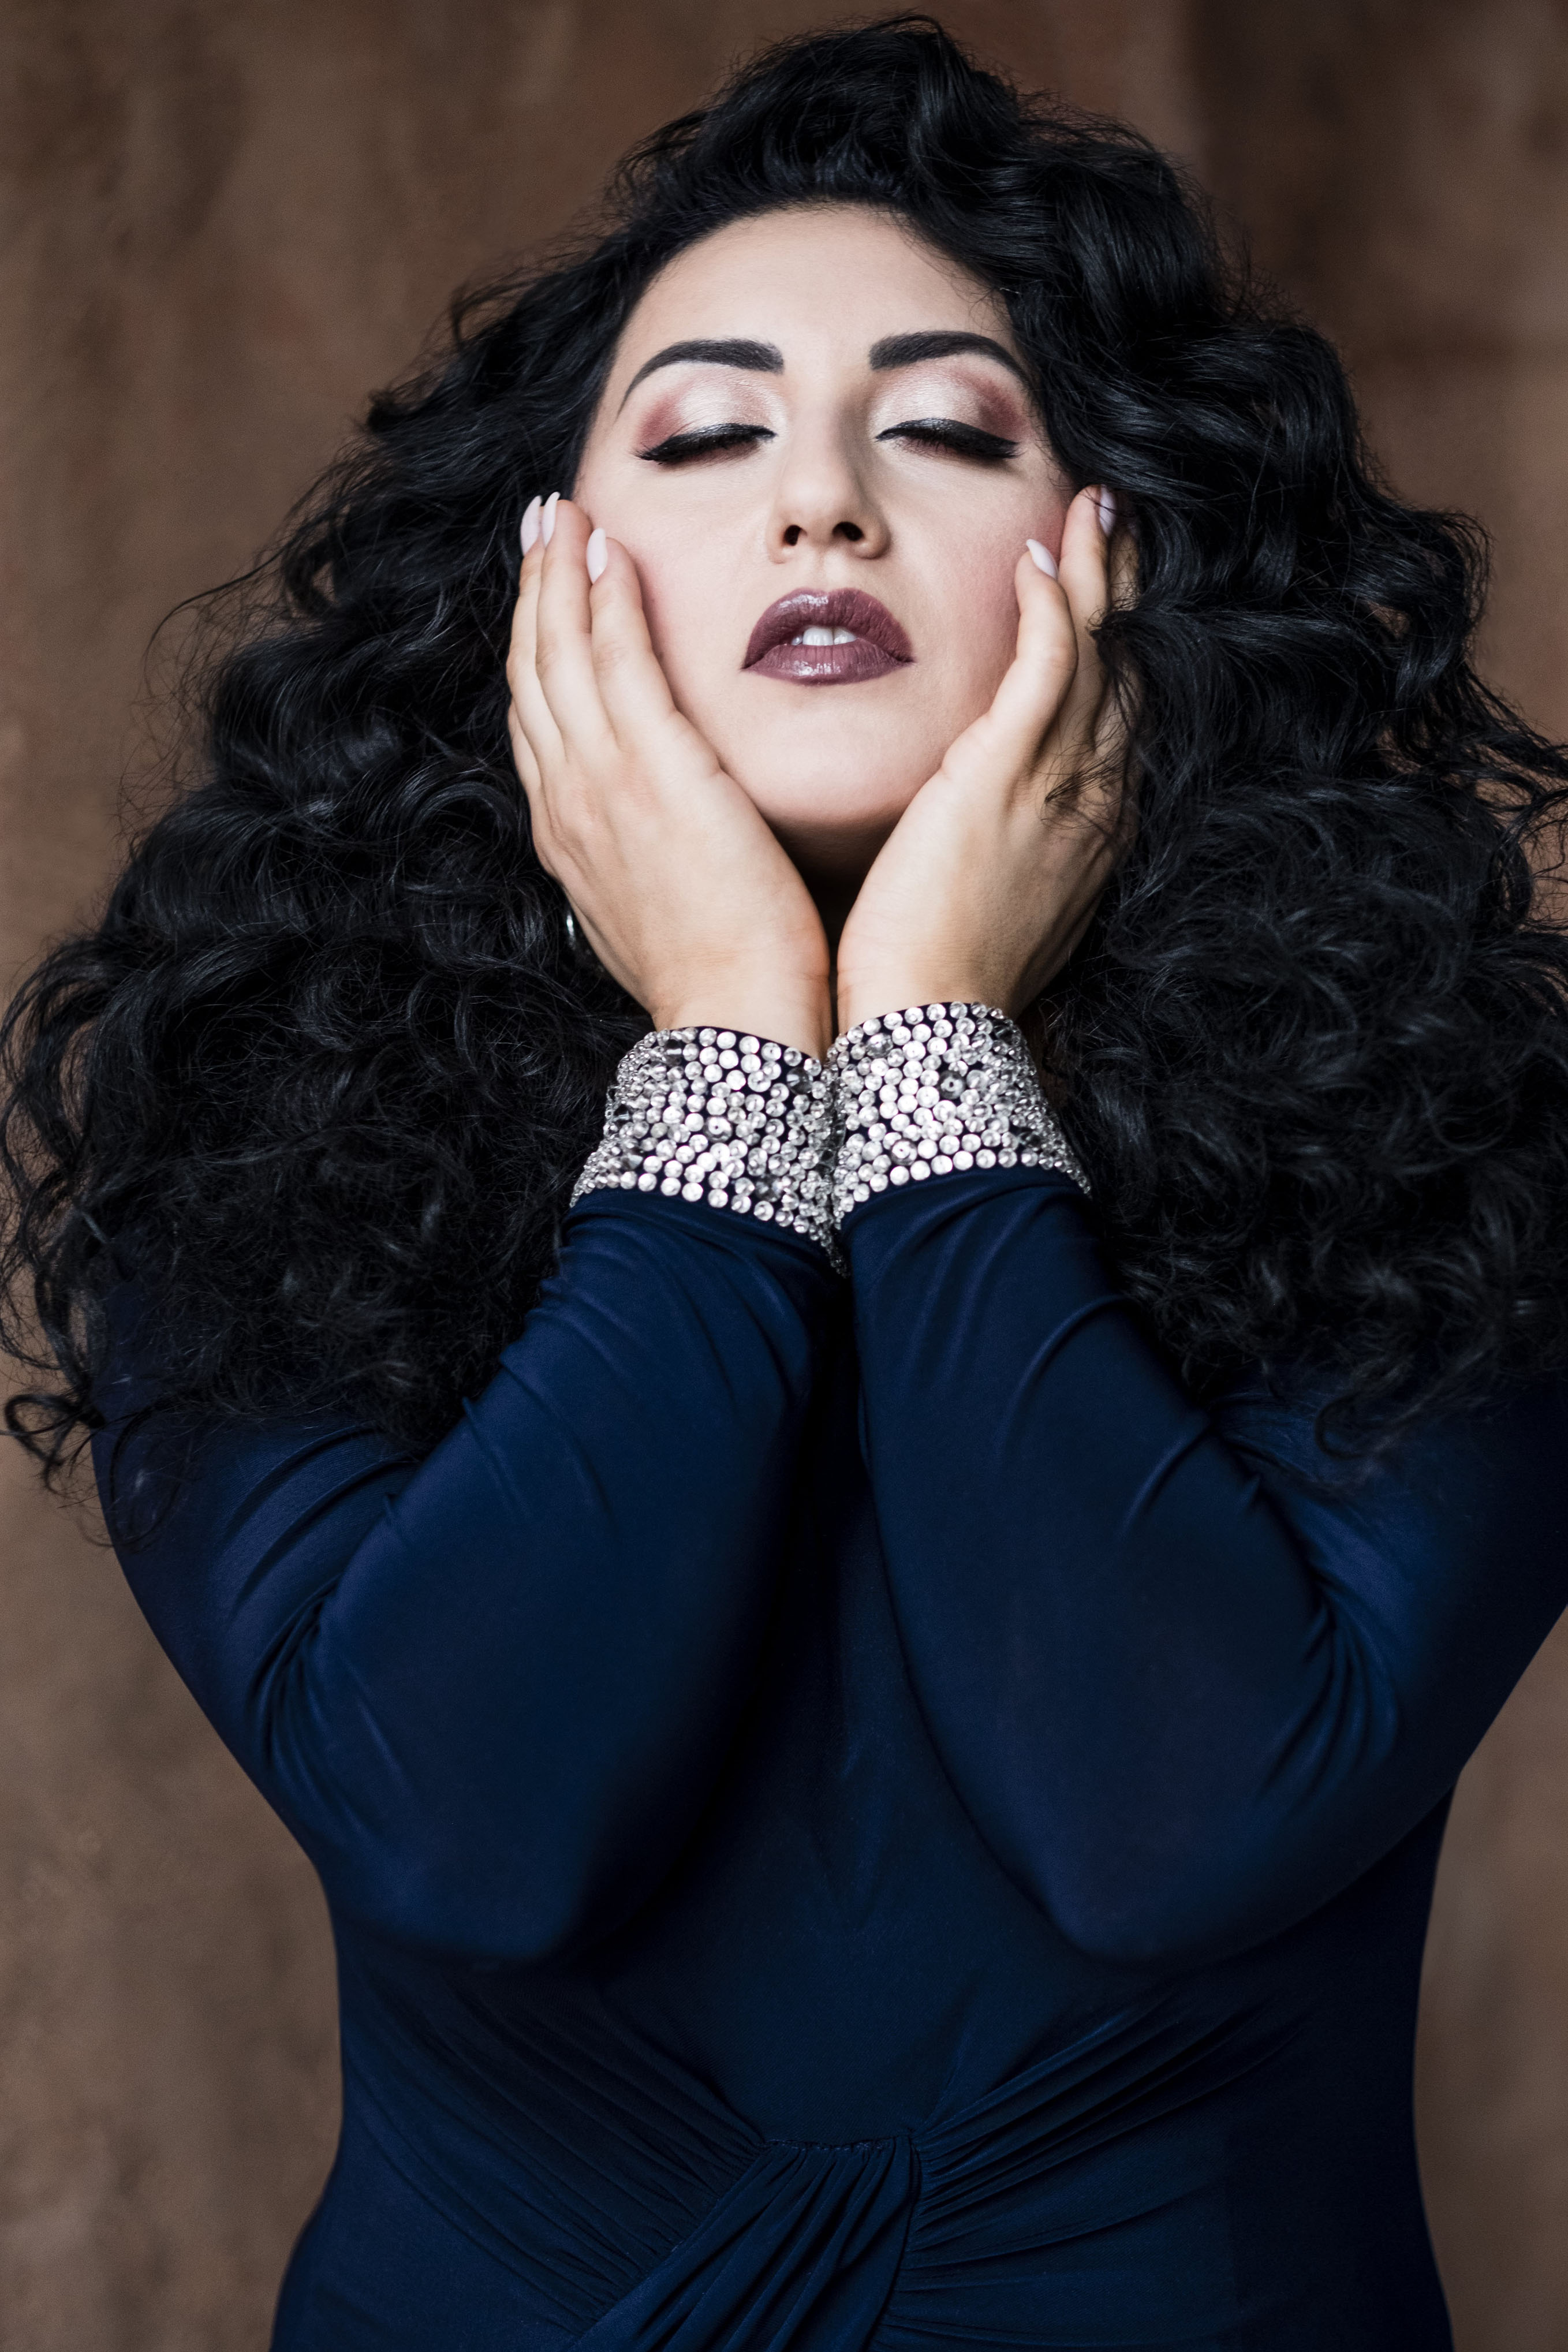 Anita Rachvelishvili debuta a les Arts amb cançons de Txaikovski, Falla, Rakhmàninov i Tosti